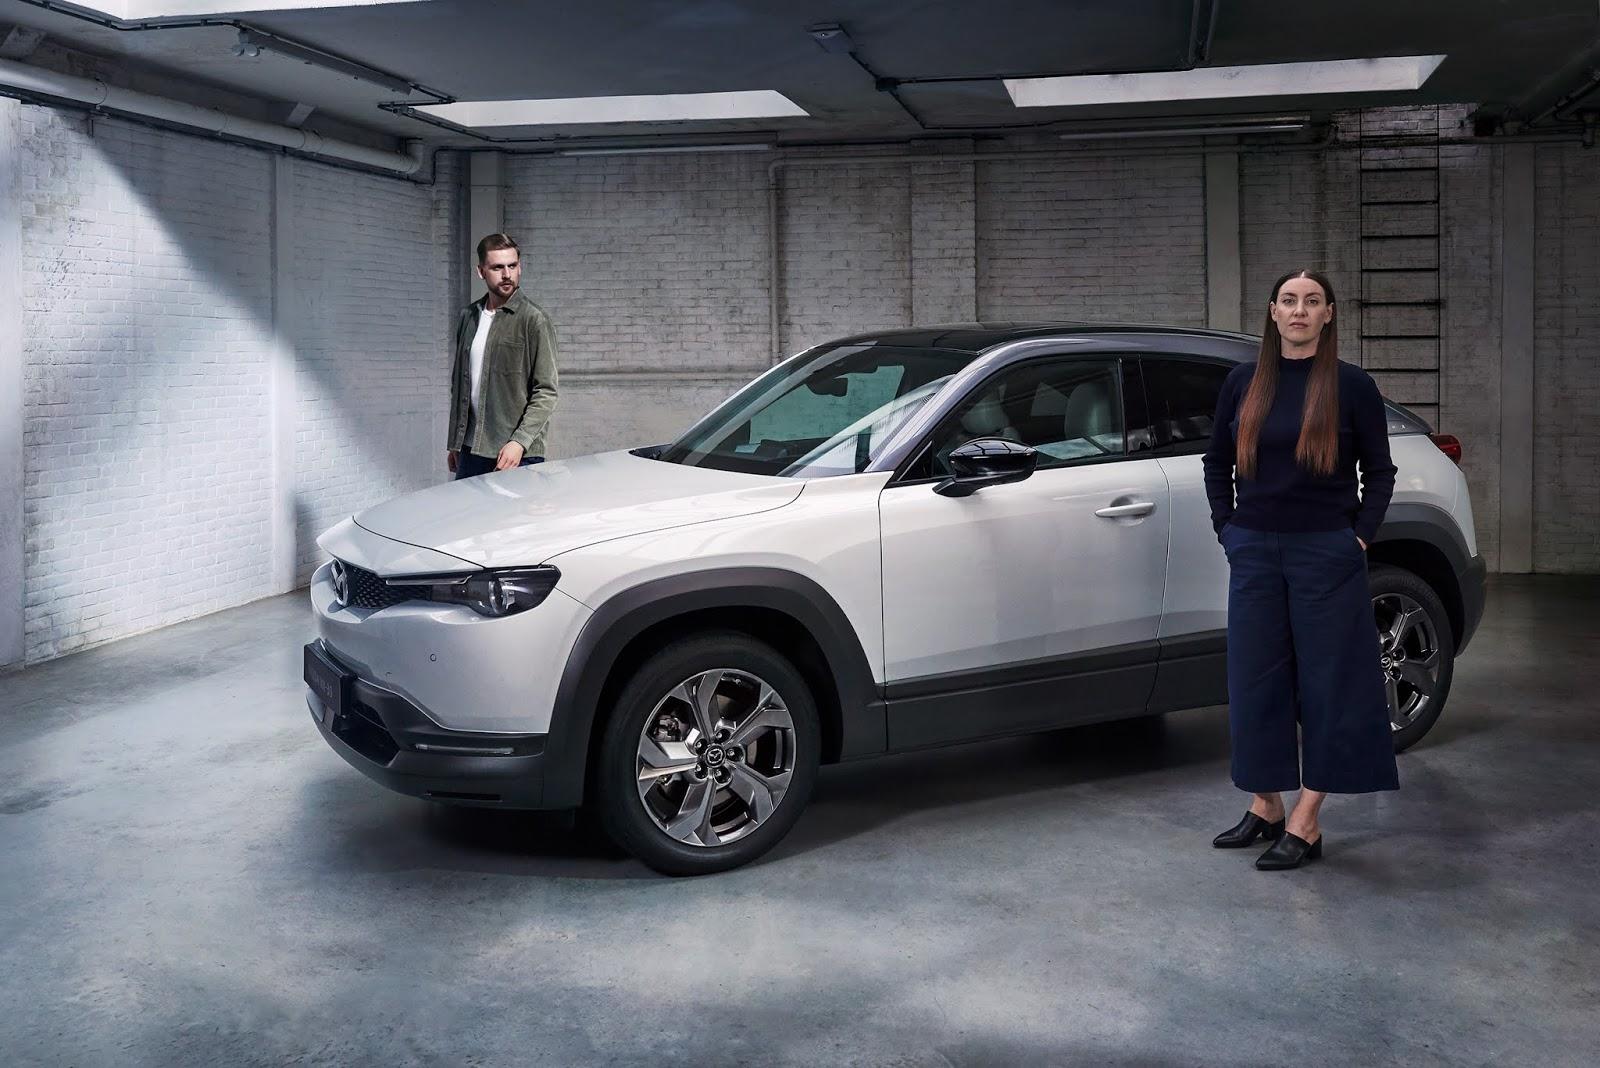 2020 MX30 DesignReview KV 1 Οι σχεδιαστές του μέλλοντος αξιολογούν το Mazda MX-30